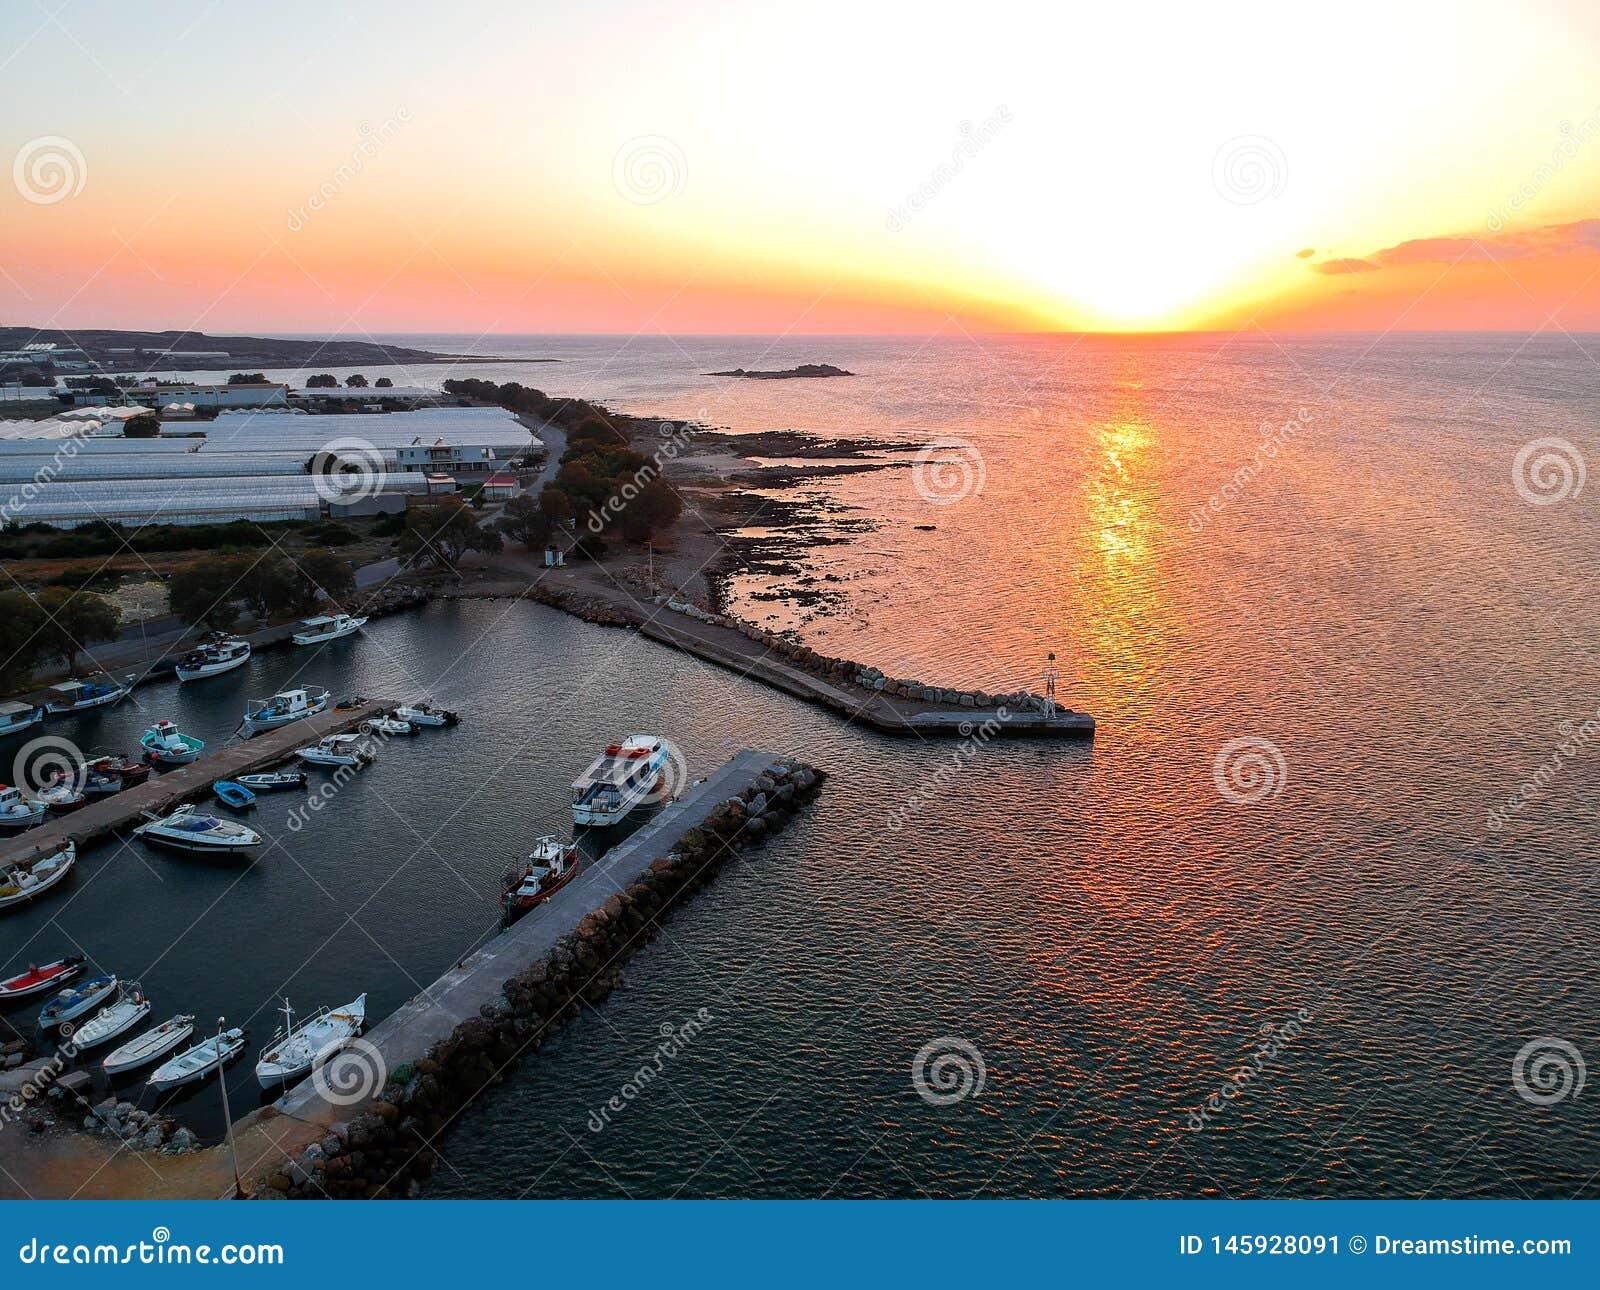 Falasarna, Greece Sunset over sea drone view